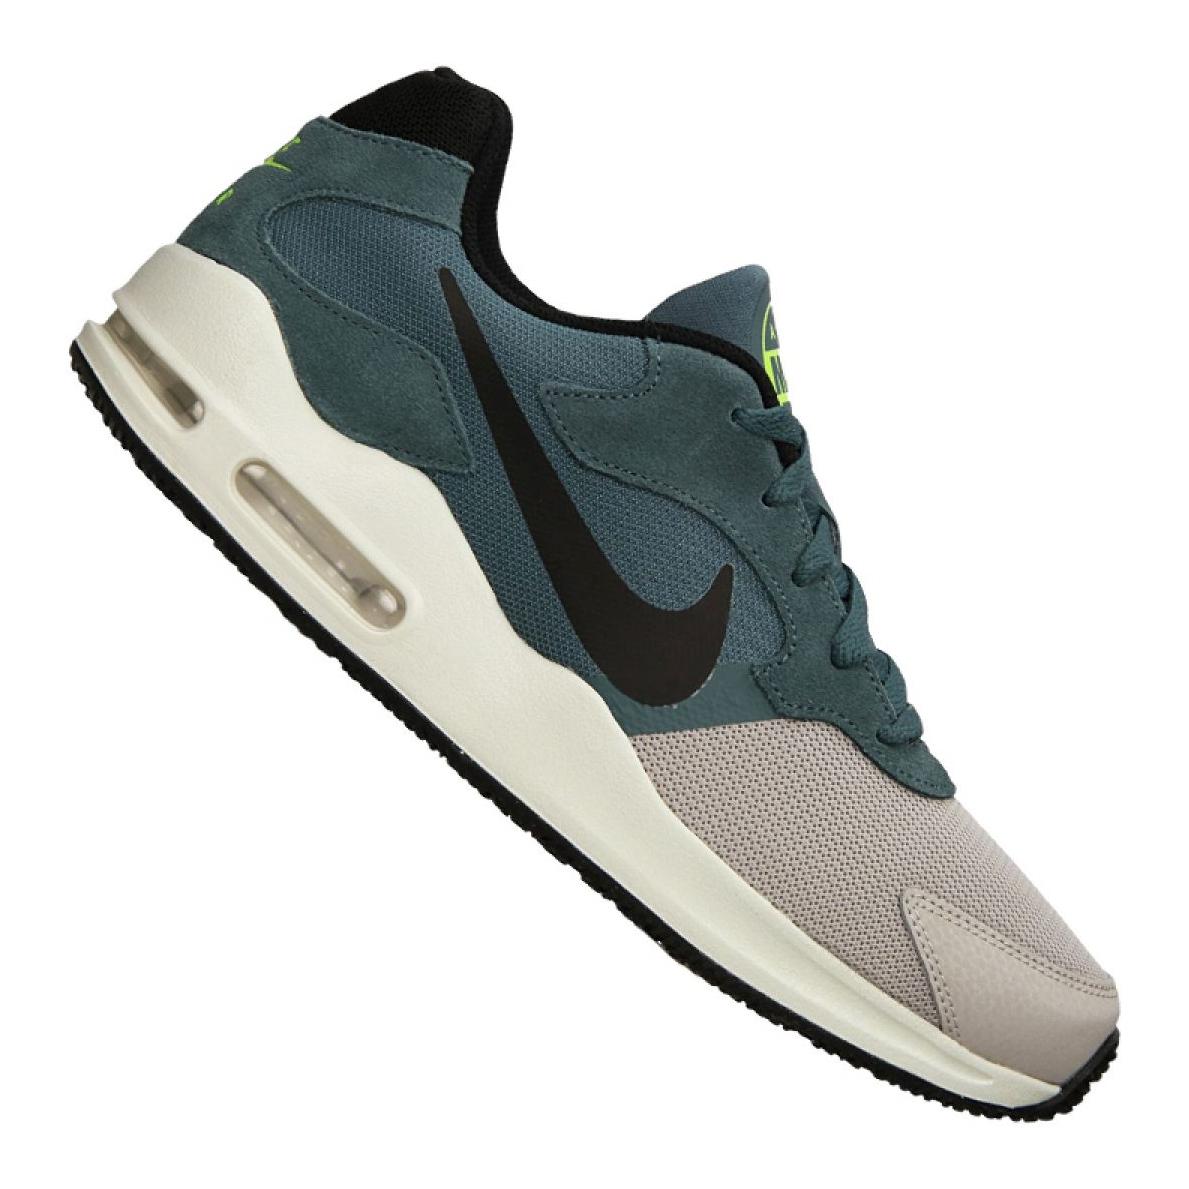 Sapatilhas Nike Air Max Guile M 916768 005